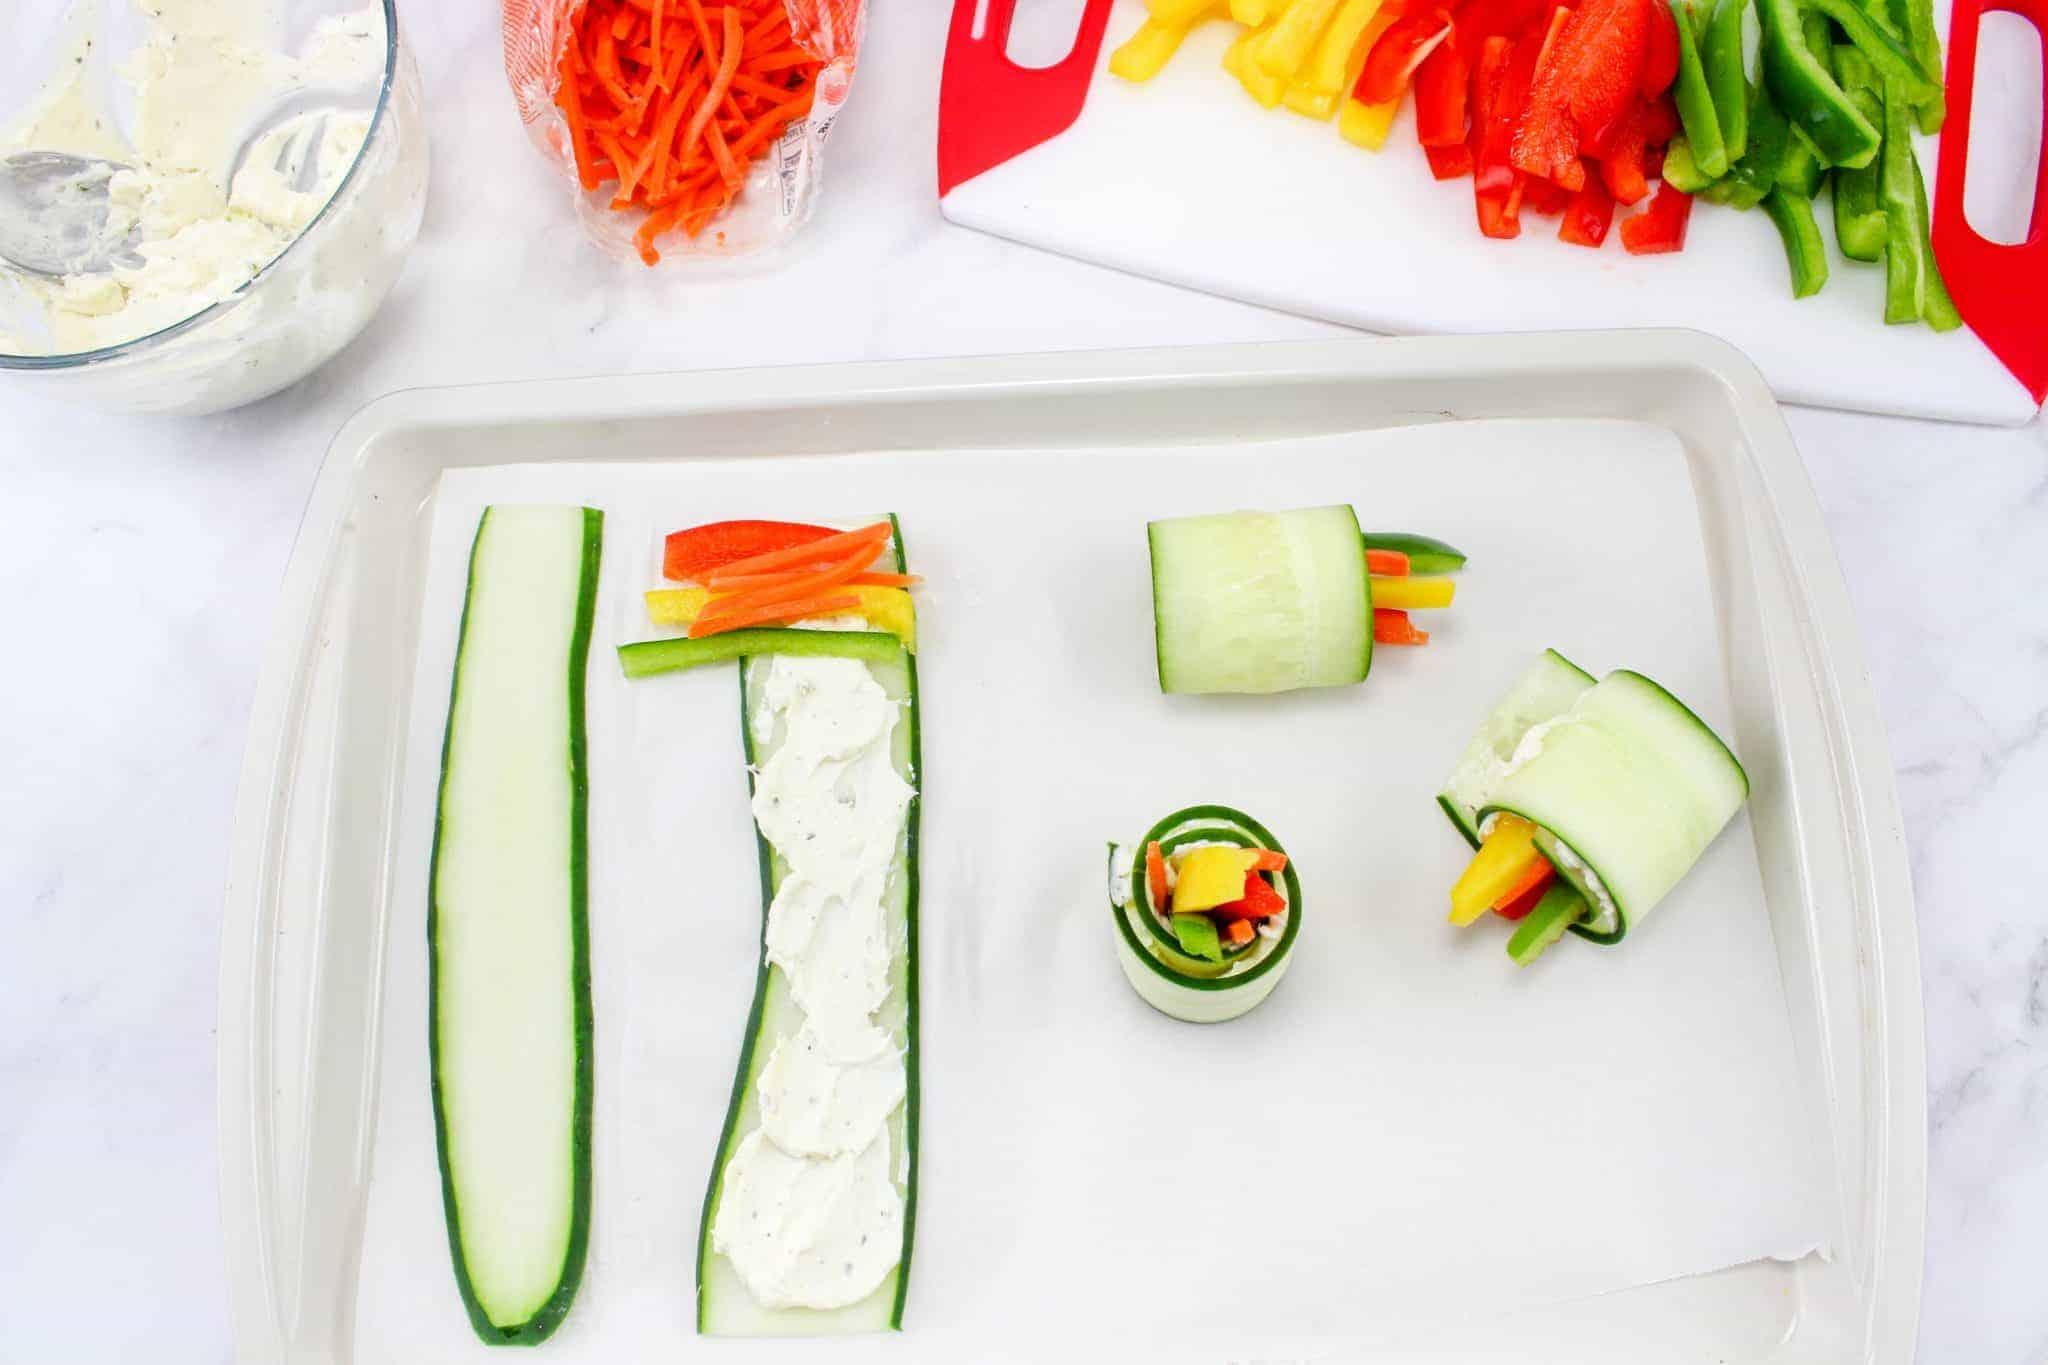 making Tasty Vegetable and cucumber bites recipe